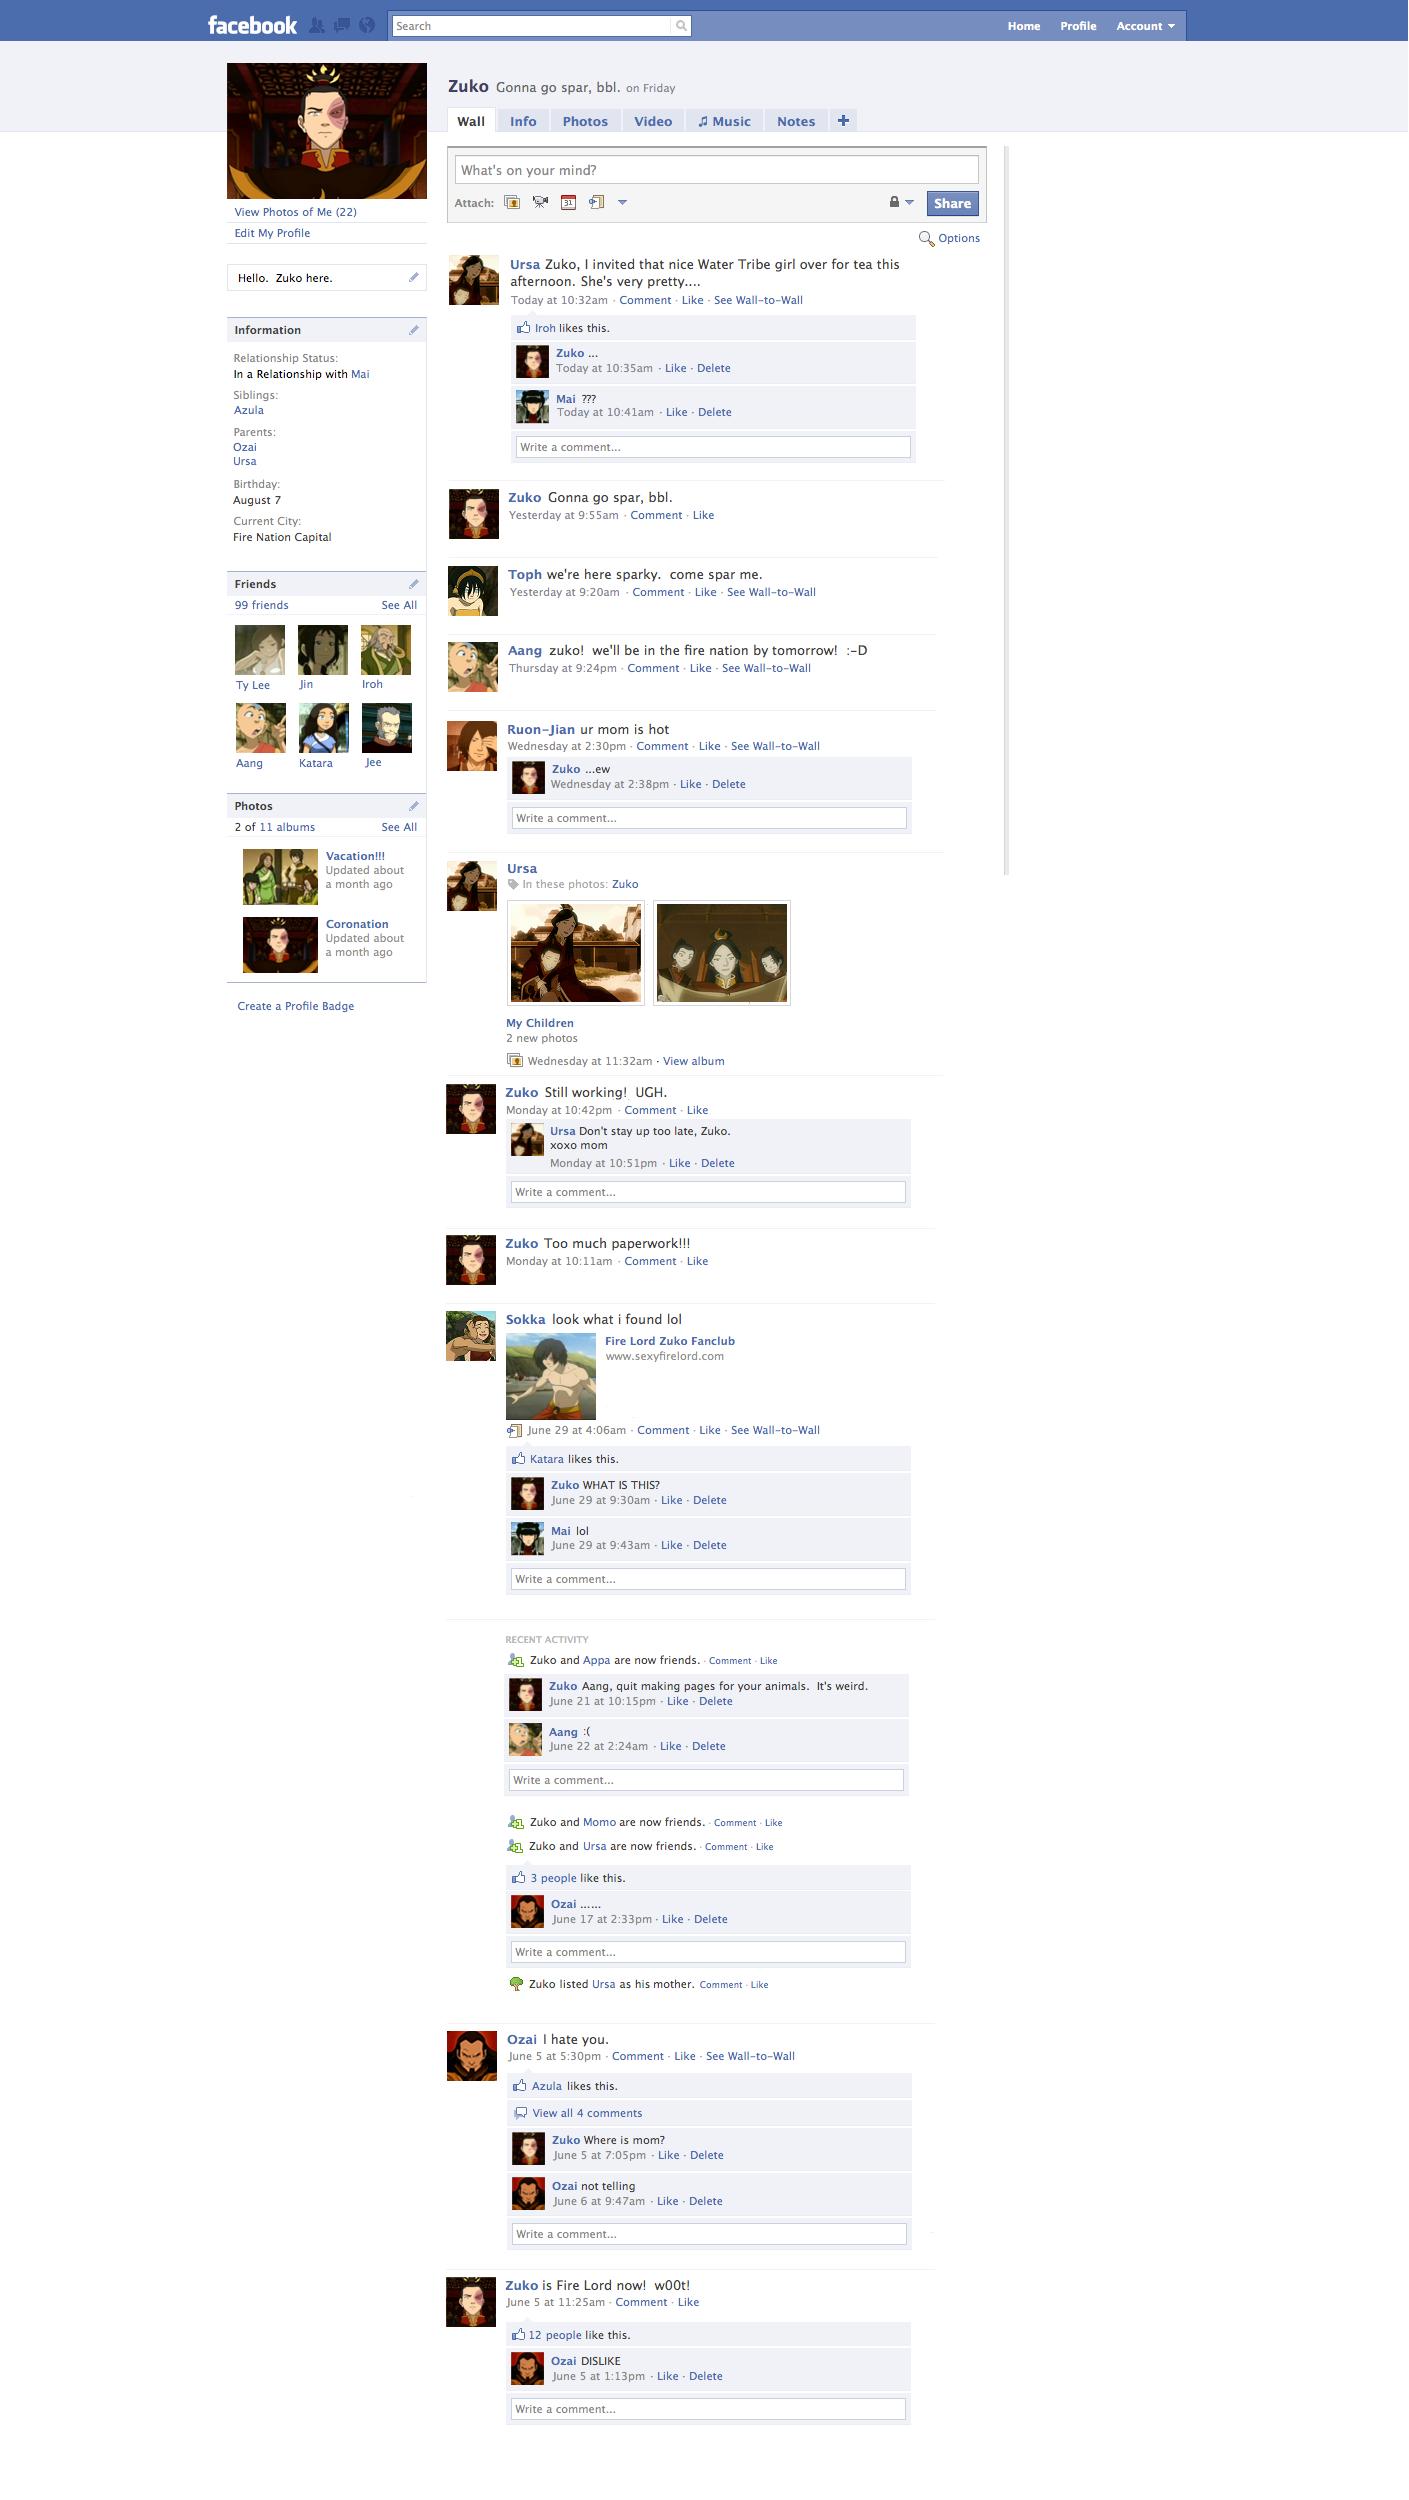 Zuko's Facebook by poopyhead1234